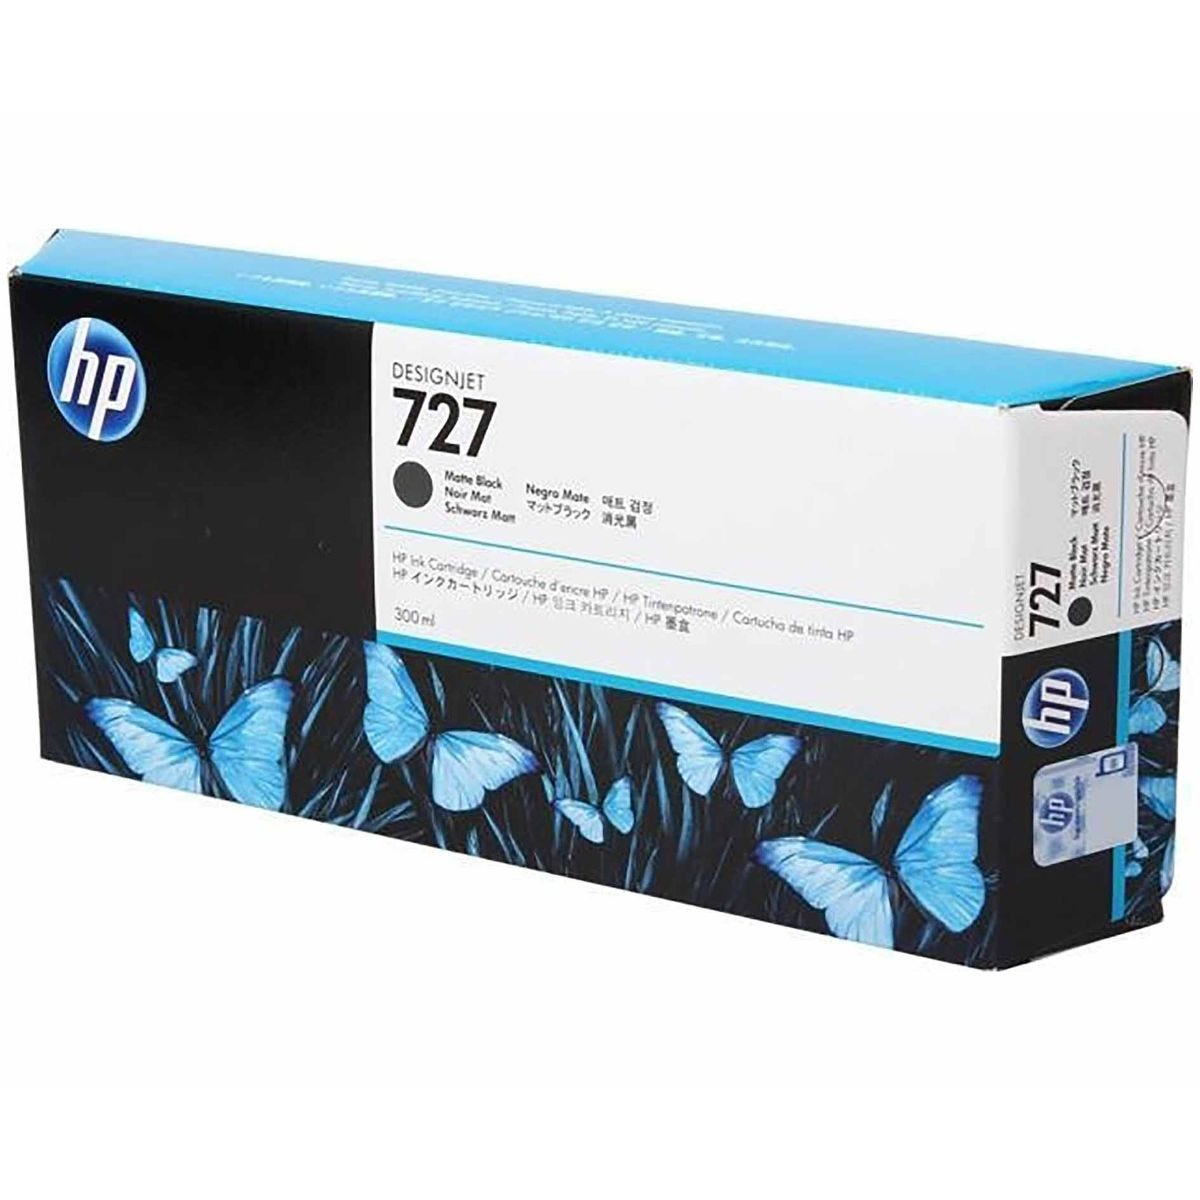 HP 727 300ml Ink Matte Black, Matte Black